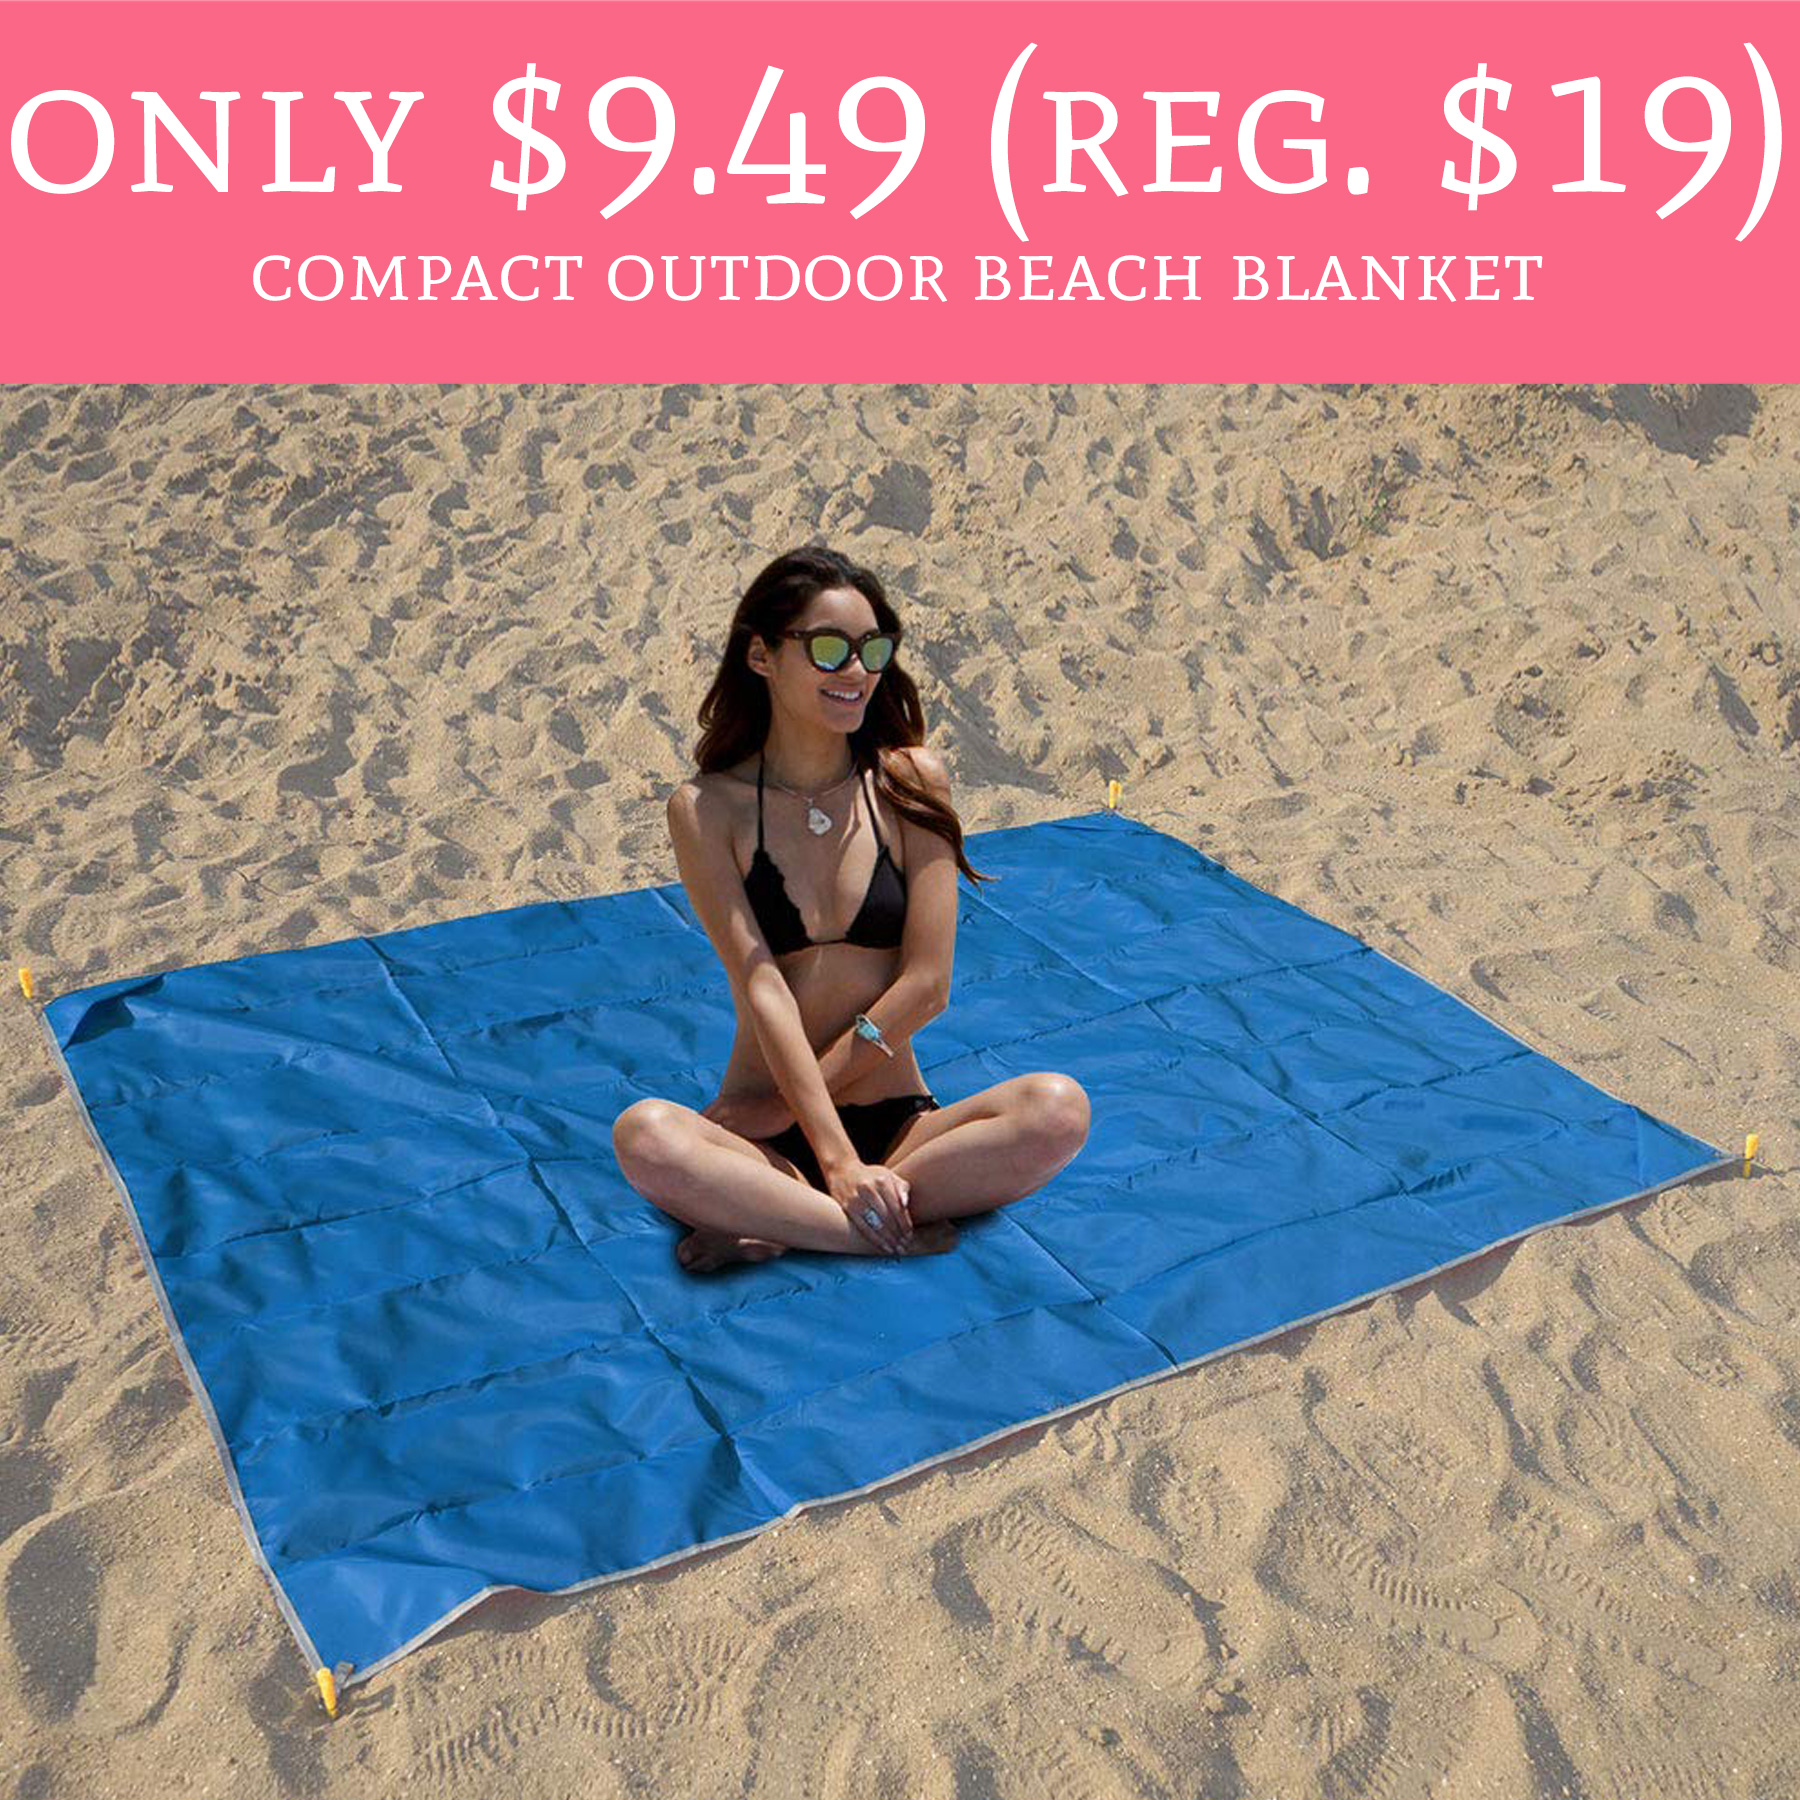 Beach Blanket No Sand: Only $9.49 (Regular $19) Compact Outdoor Beach Blanket